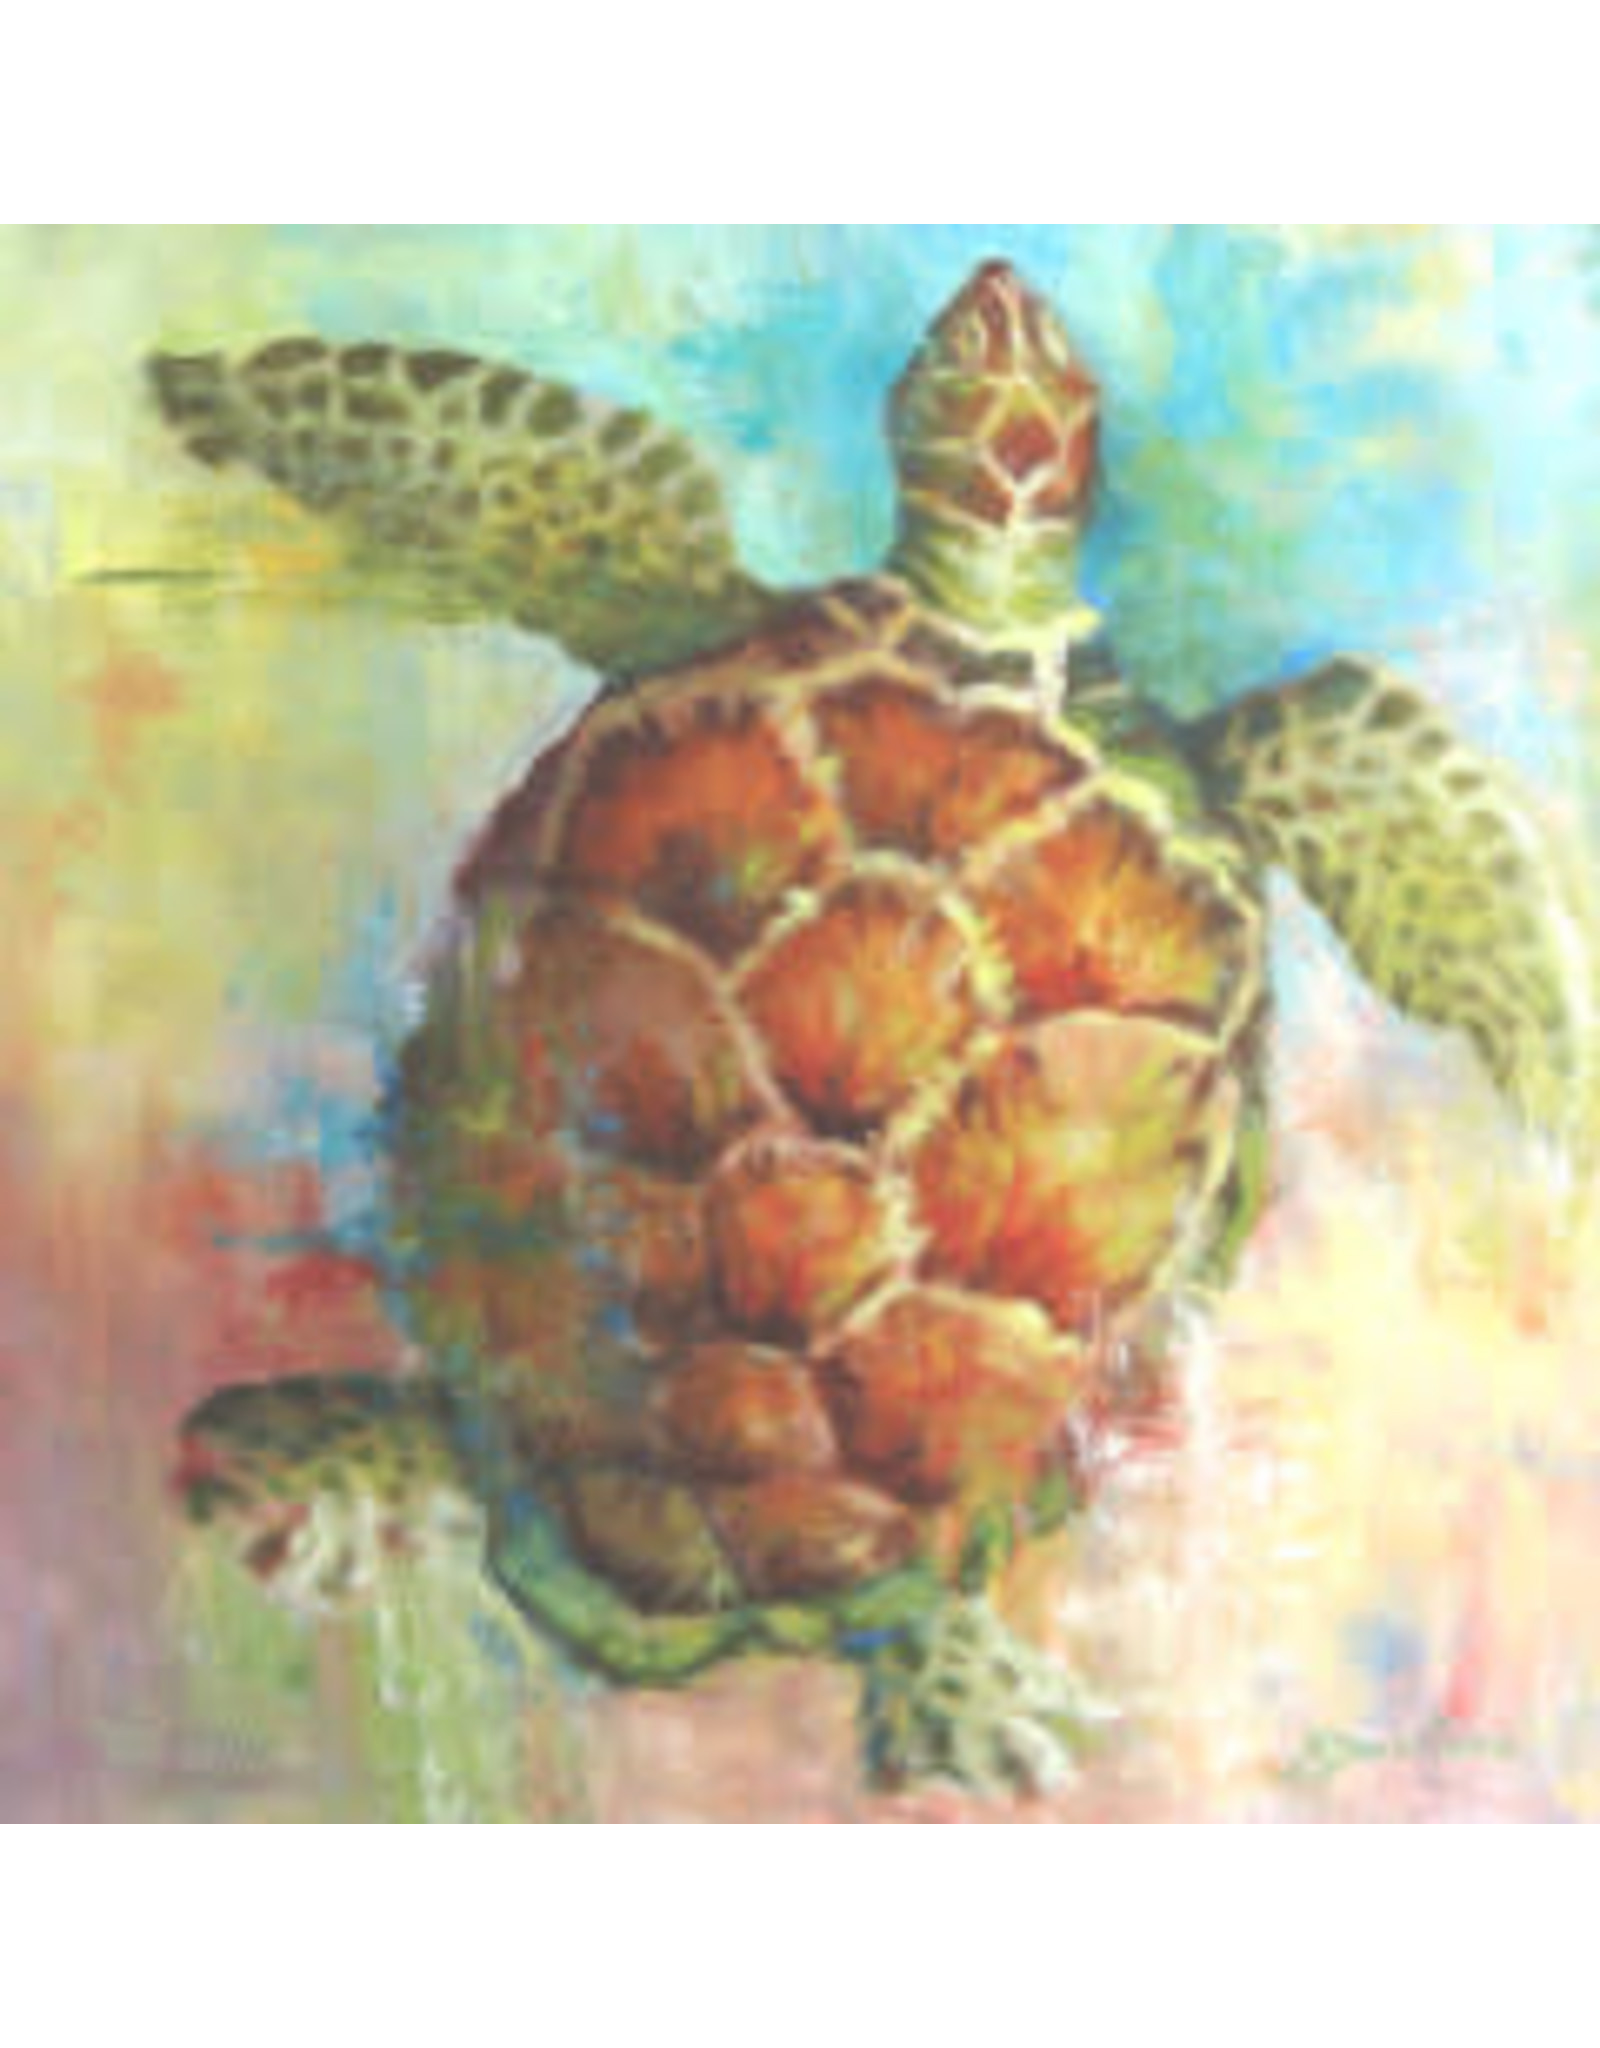 "Michaelann Bellerjeau CARIBBEAN CALICO, turtle, original oil on GW canvas, 20x20"", MICB"